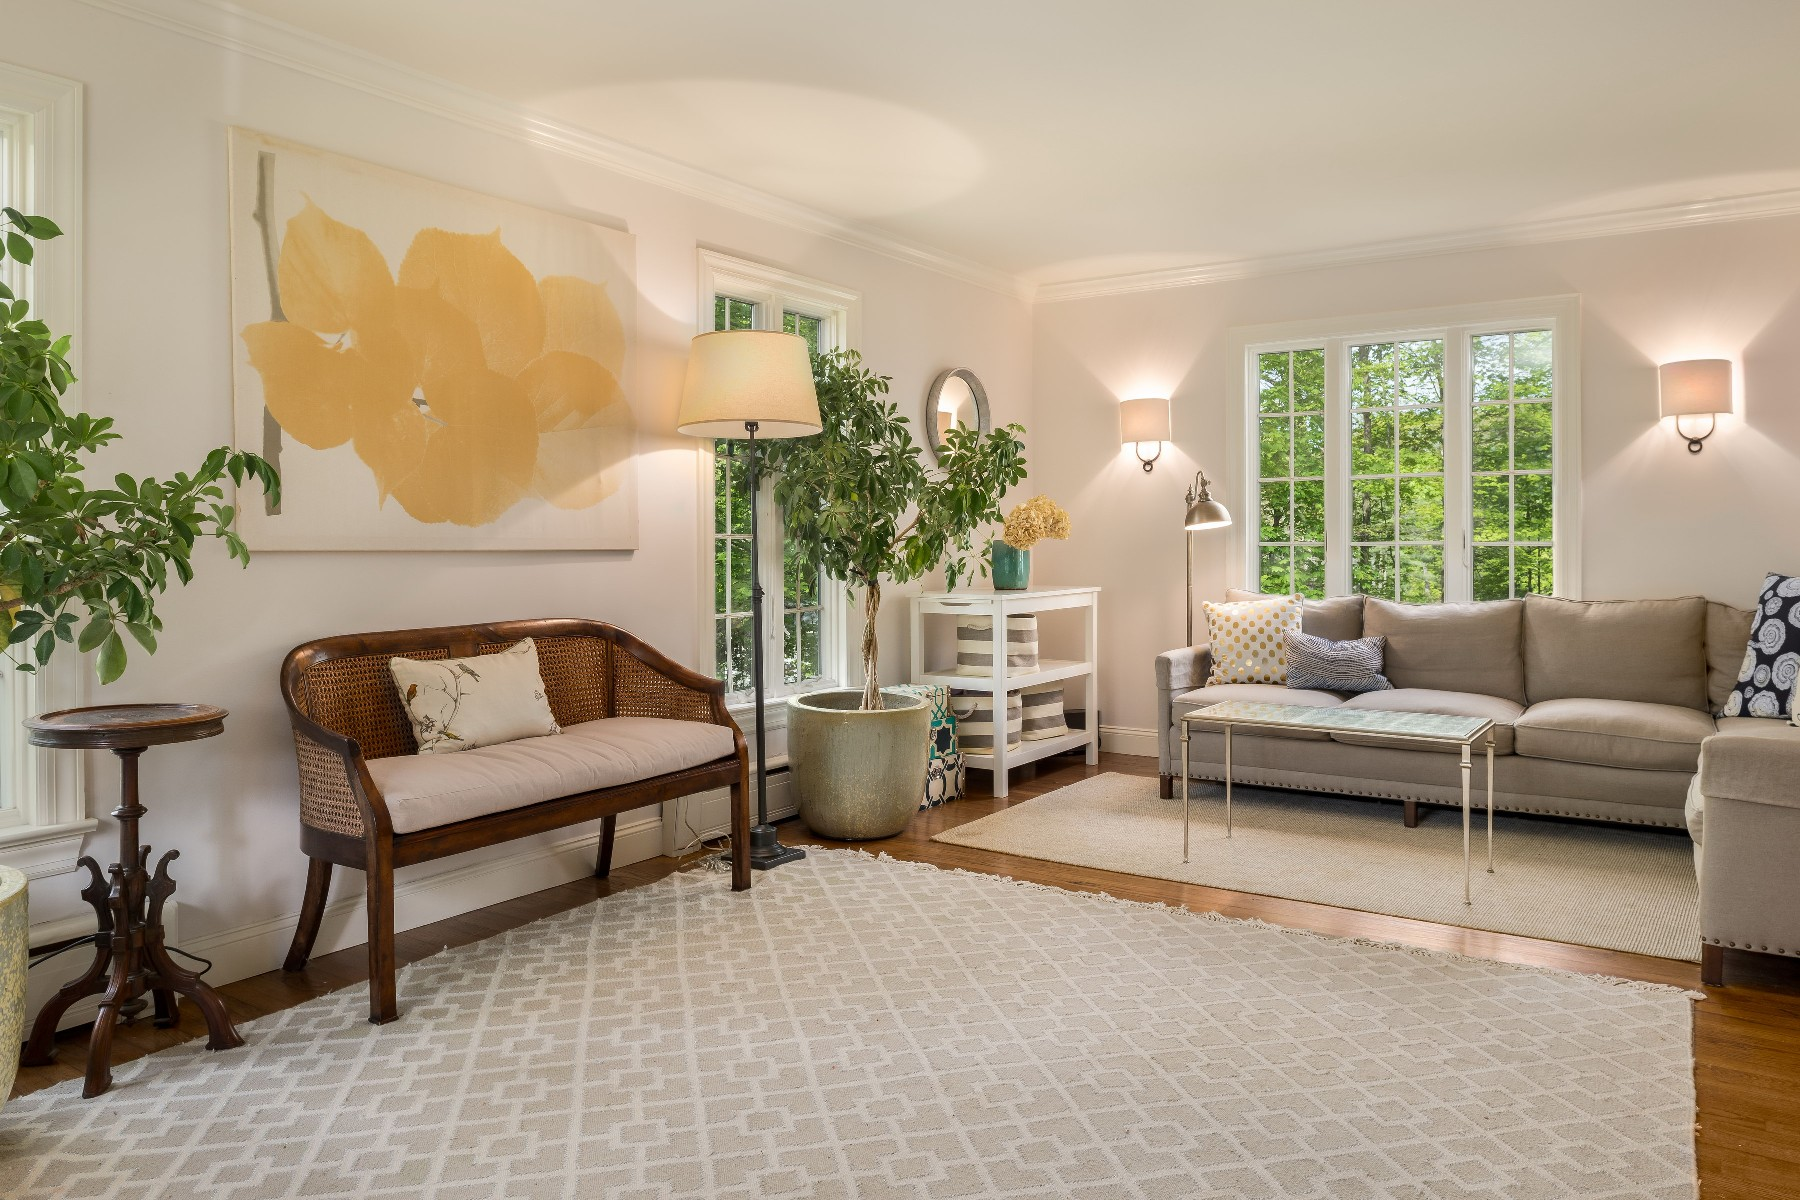 Single Family Home for Sale at Exquisite Rowayton Home 38 Vanderbilt Avenue Rowayton, Norwalk, Connecticut, 06854 United States